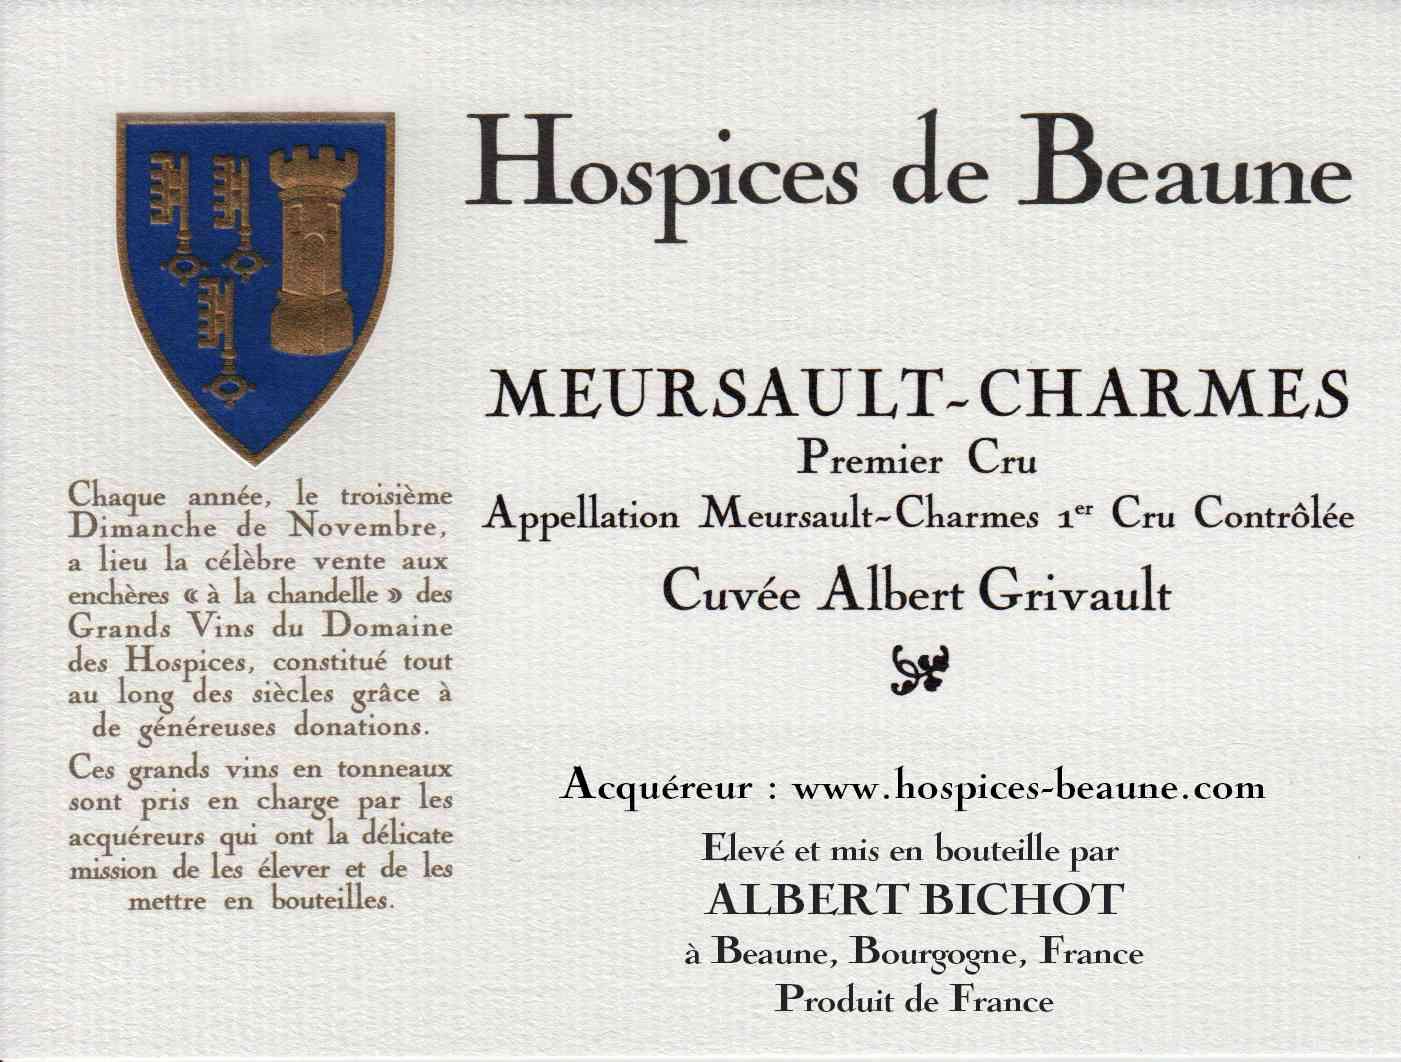 Encheres-auction-HospicesdeBeaune-AlbertBichot-Meursault-Charmes-PremierCru-Cuvee-AlbertGrivault